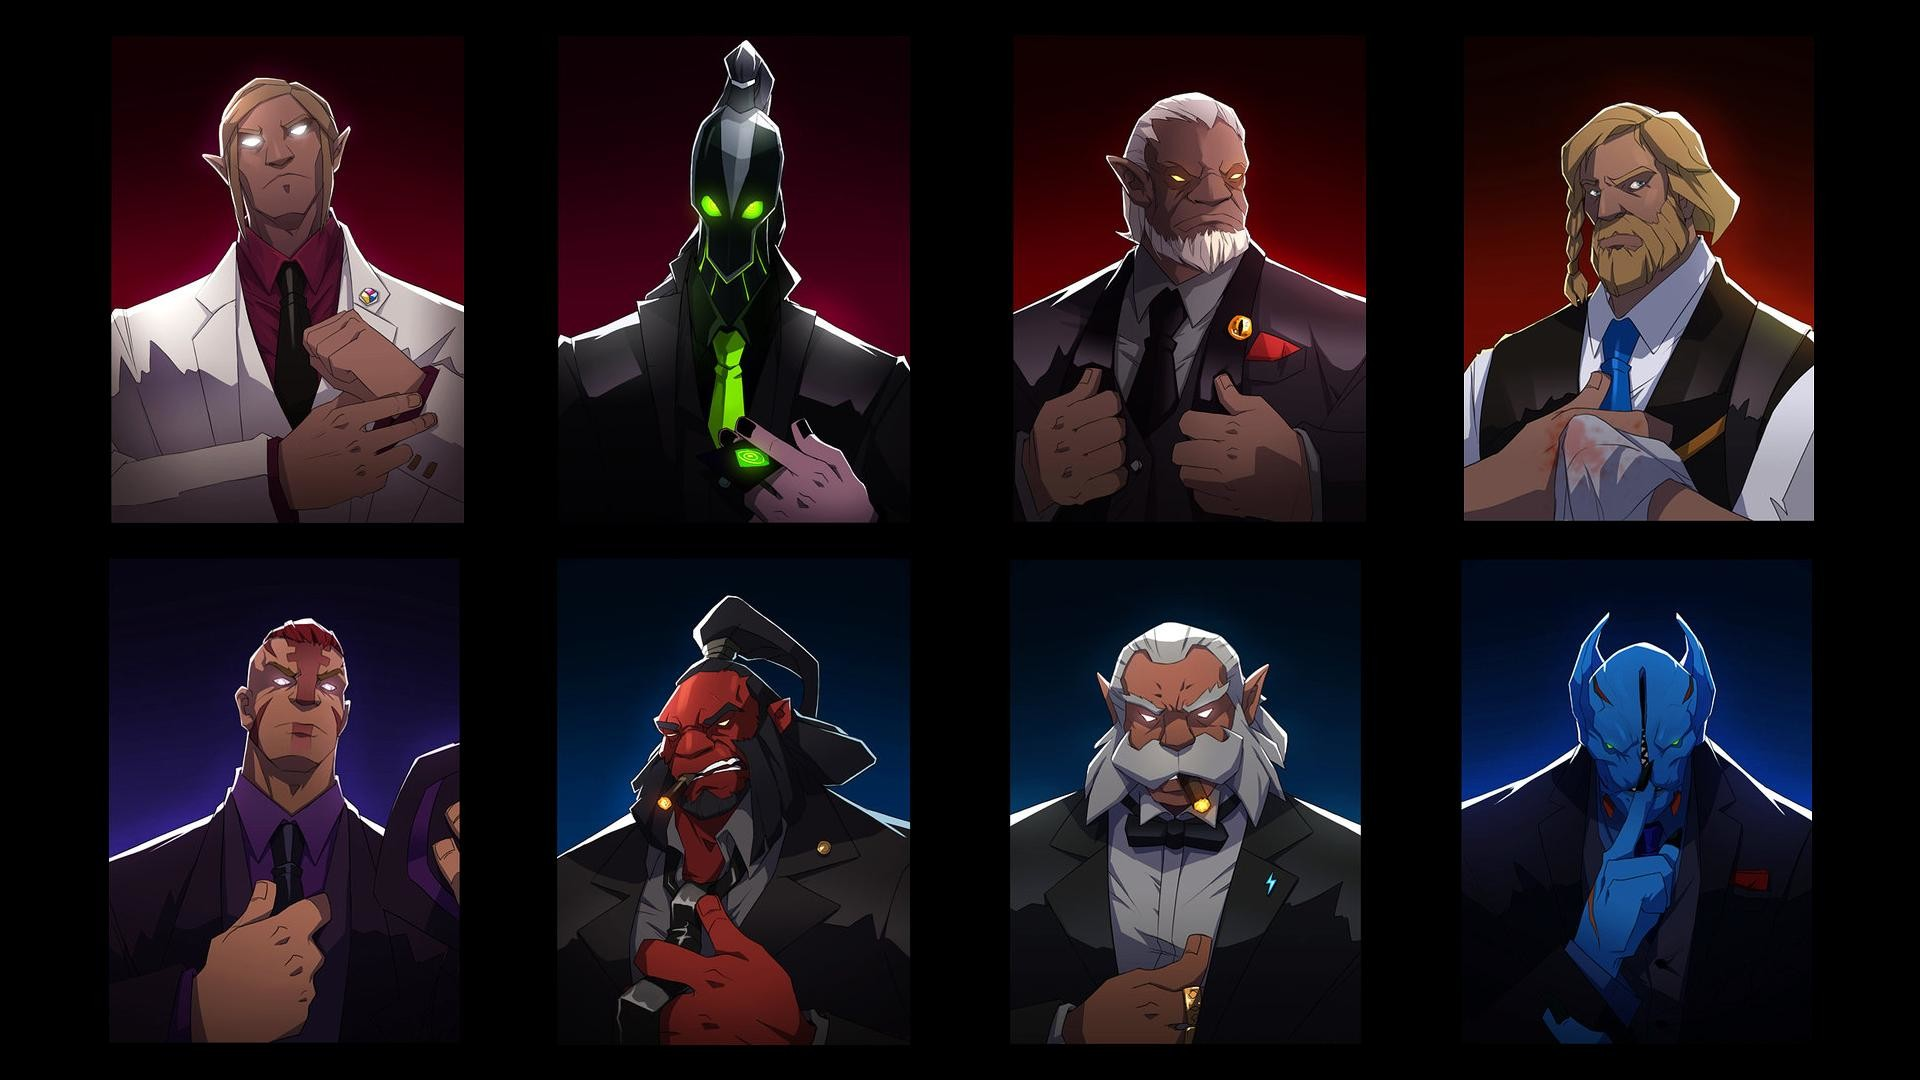 Amazing Invoker Wallpaper By Redbearon - Dota 2 Wallpaper Invoker , HD Wallpaper & Backgrounds